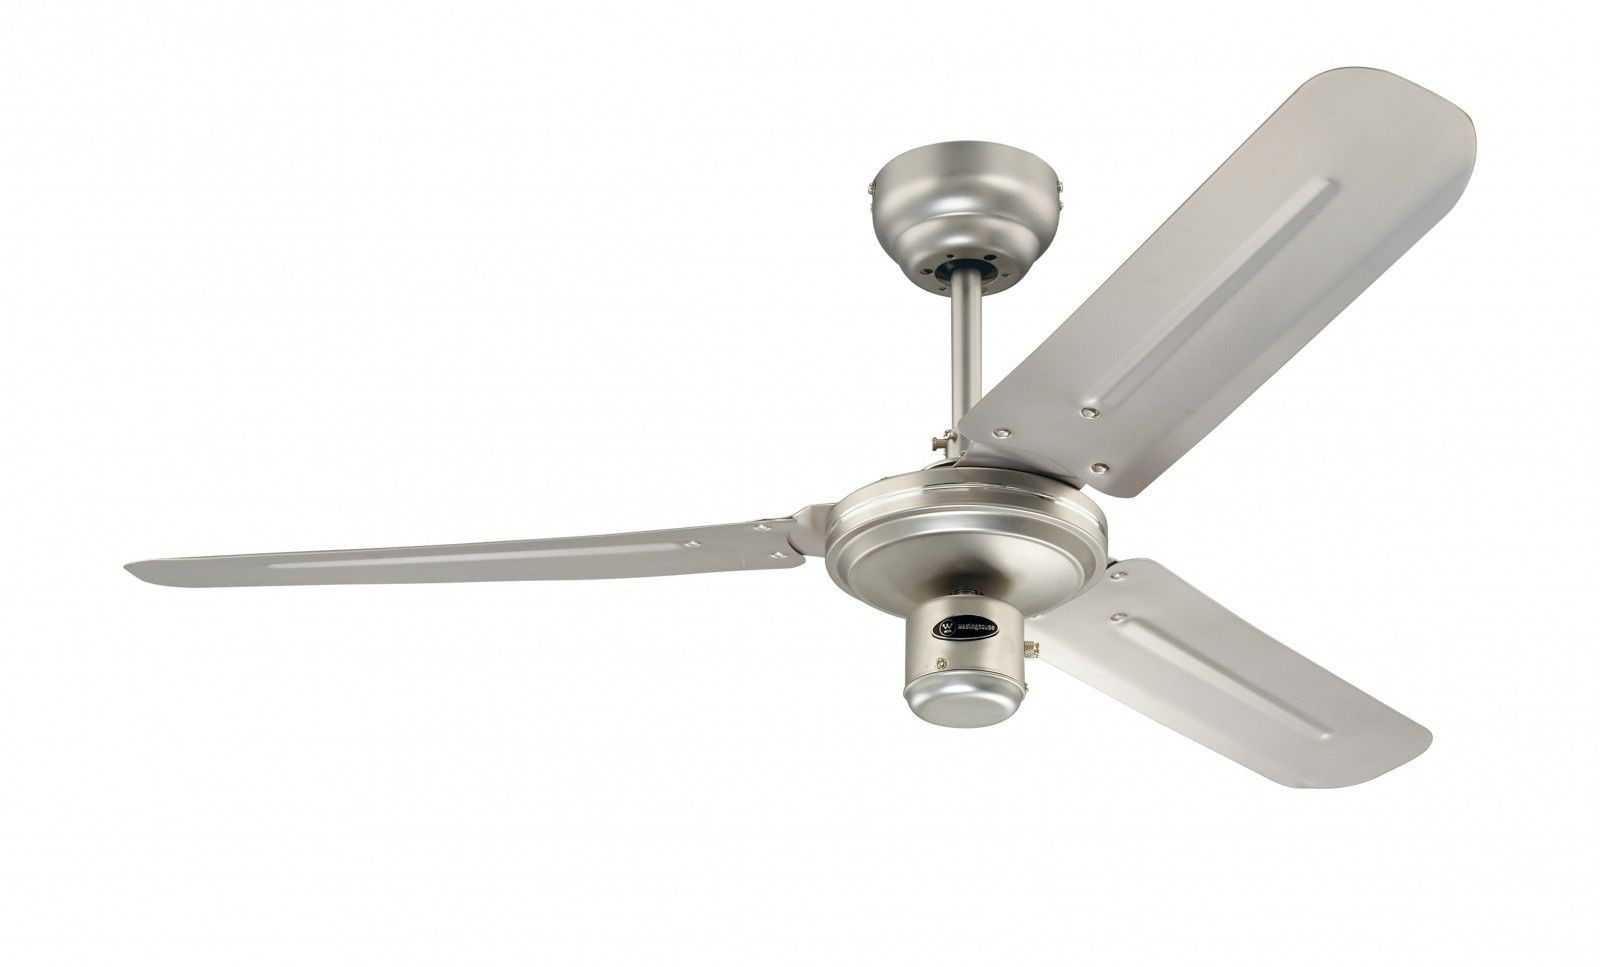 Industrial Ceiling Fans : Westinghouse industrial ceiling fan a fresh approach